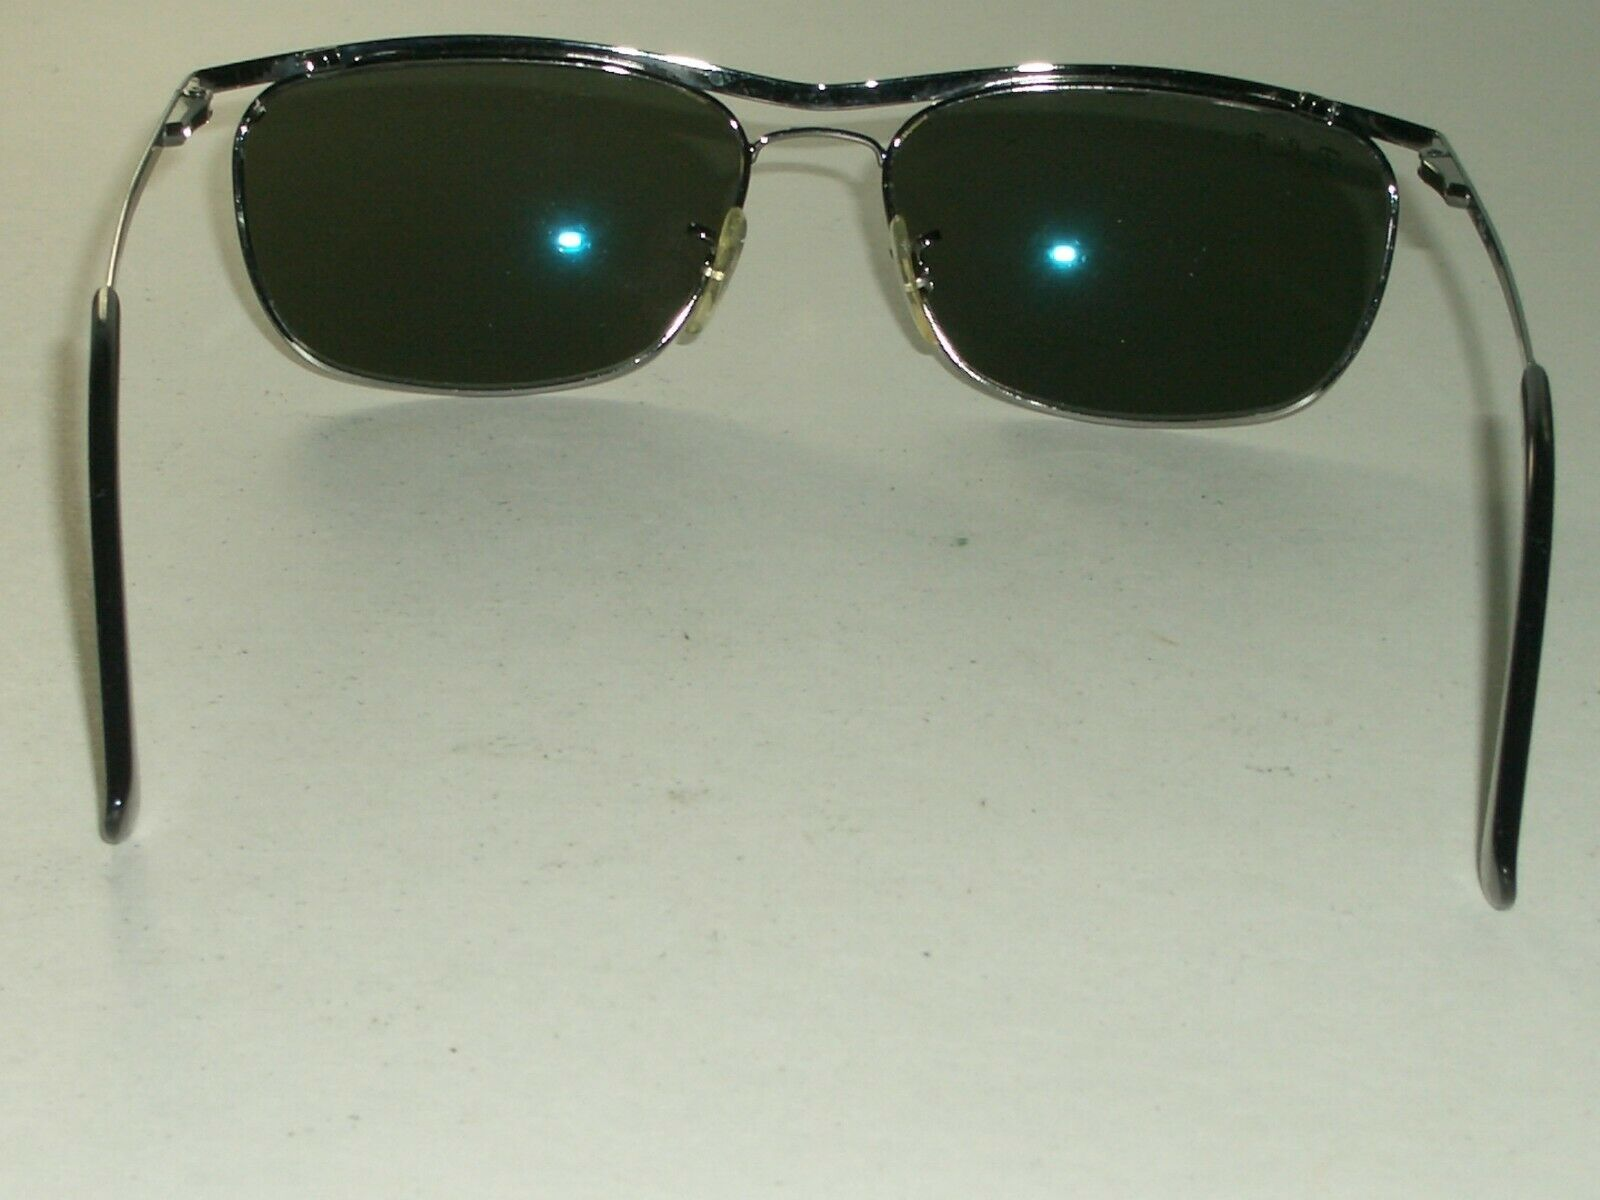 3e1b6dc2d697 Ray Ban RB3385 002 Shiny Black Olympian II Deluxe G15 UV Rectangular  Sunglasses for sale online | eBay